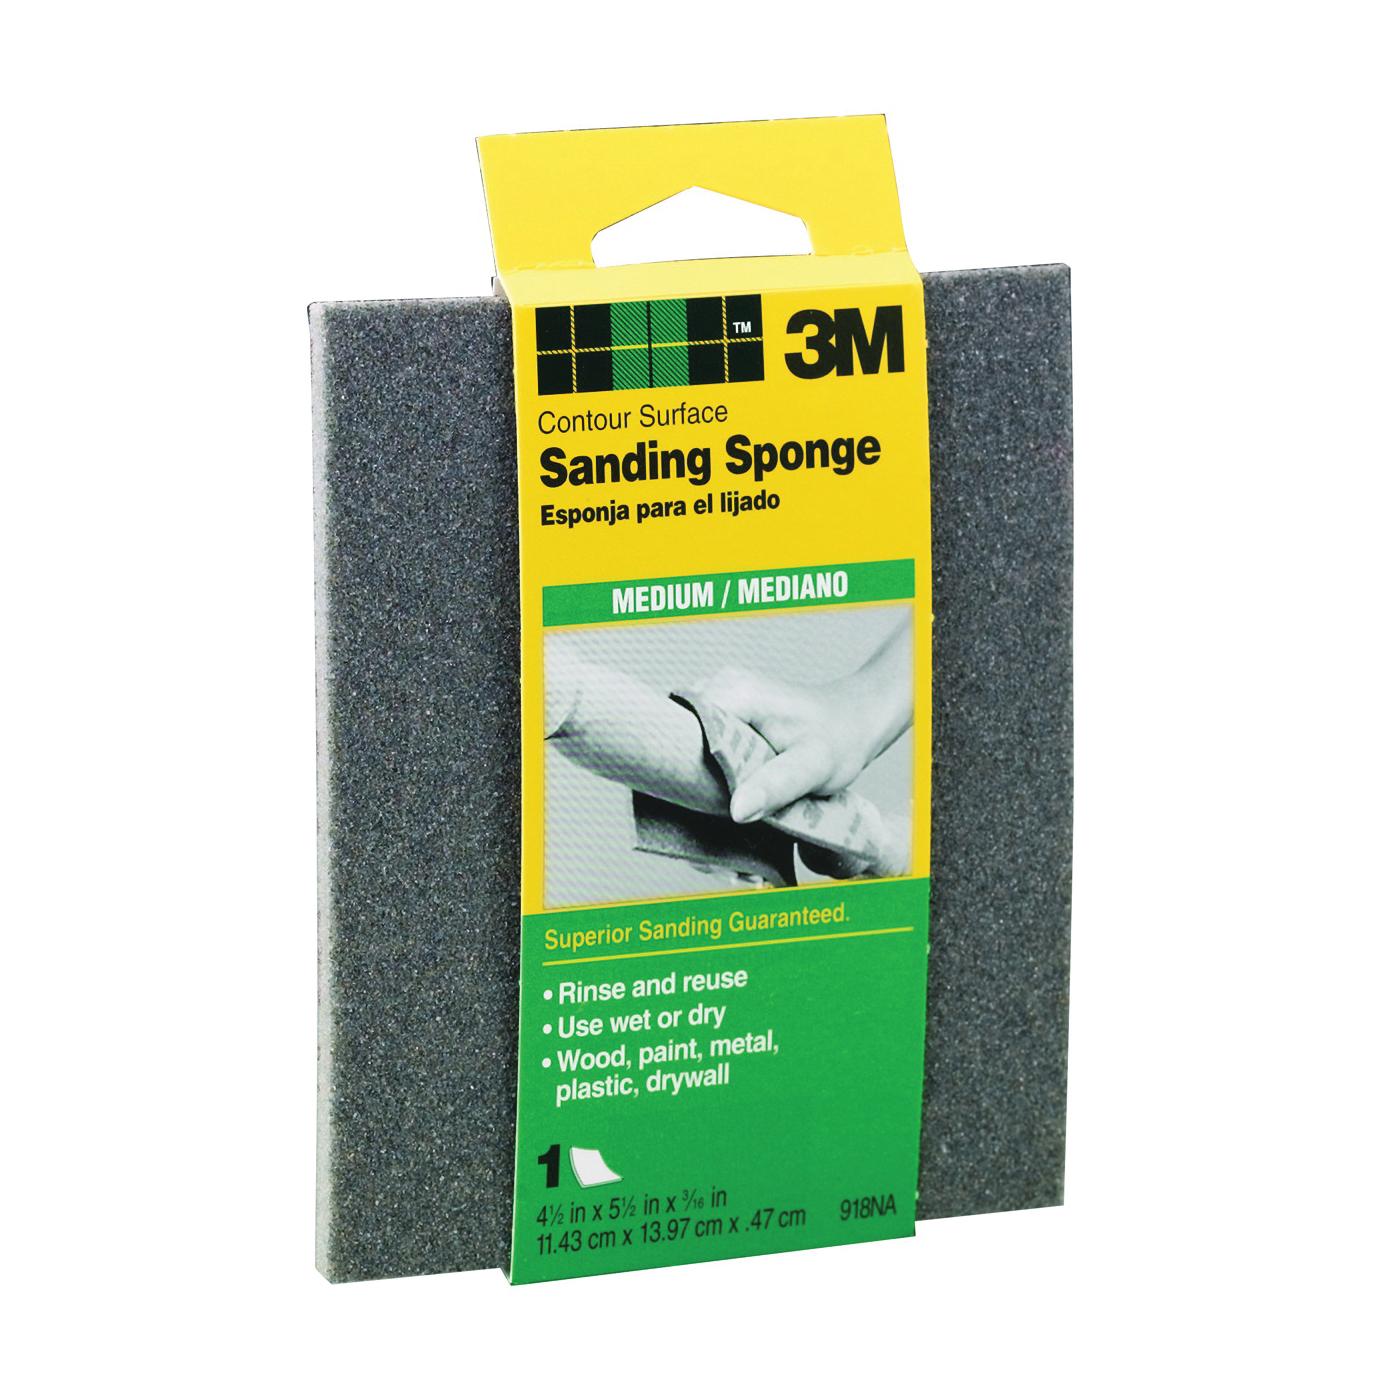 Picture of 3M 918 Sanding Sponge, 5-1/2 in L, 4-1/2 in W, 80 Grit, Medium